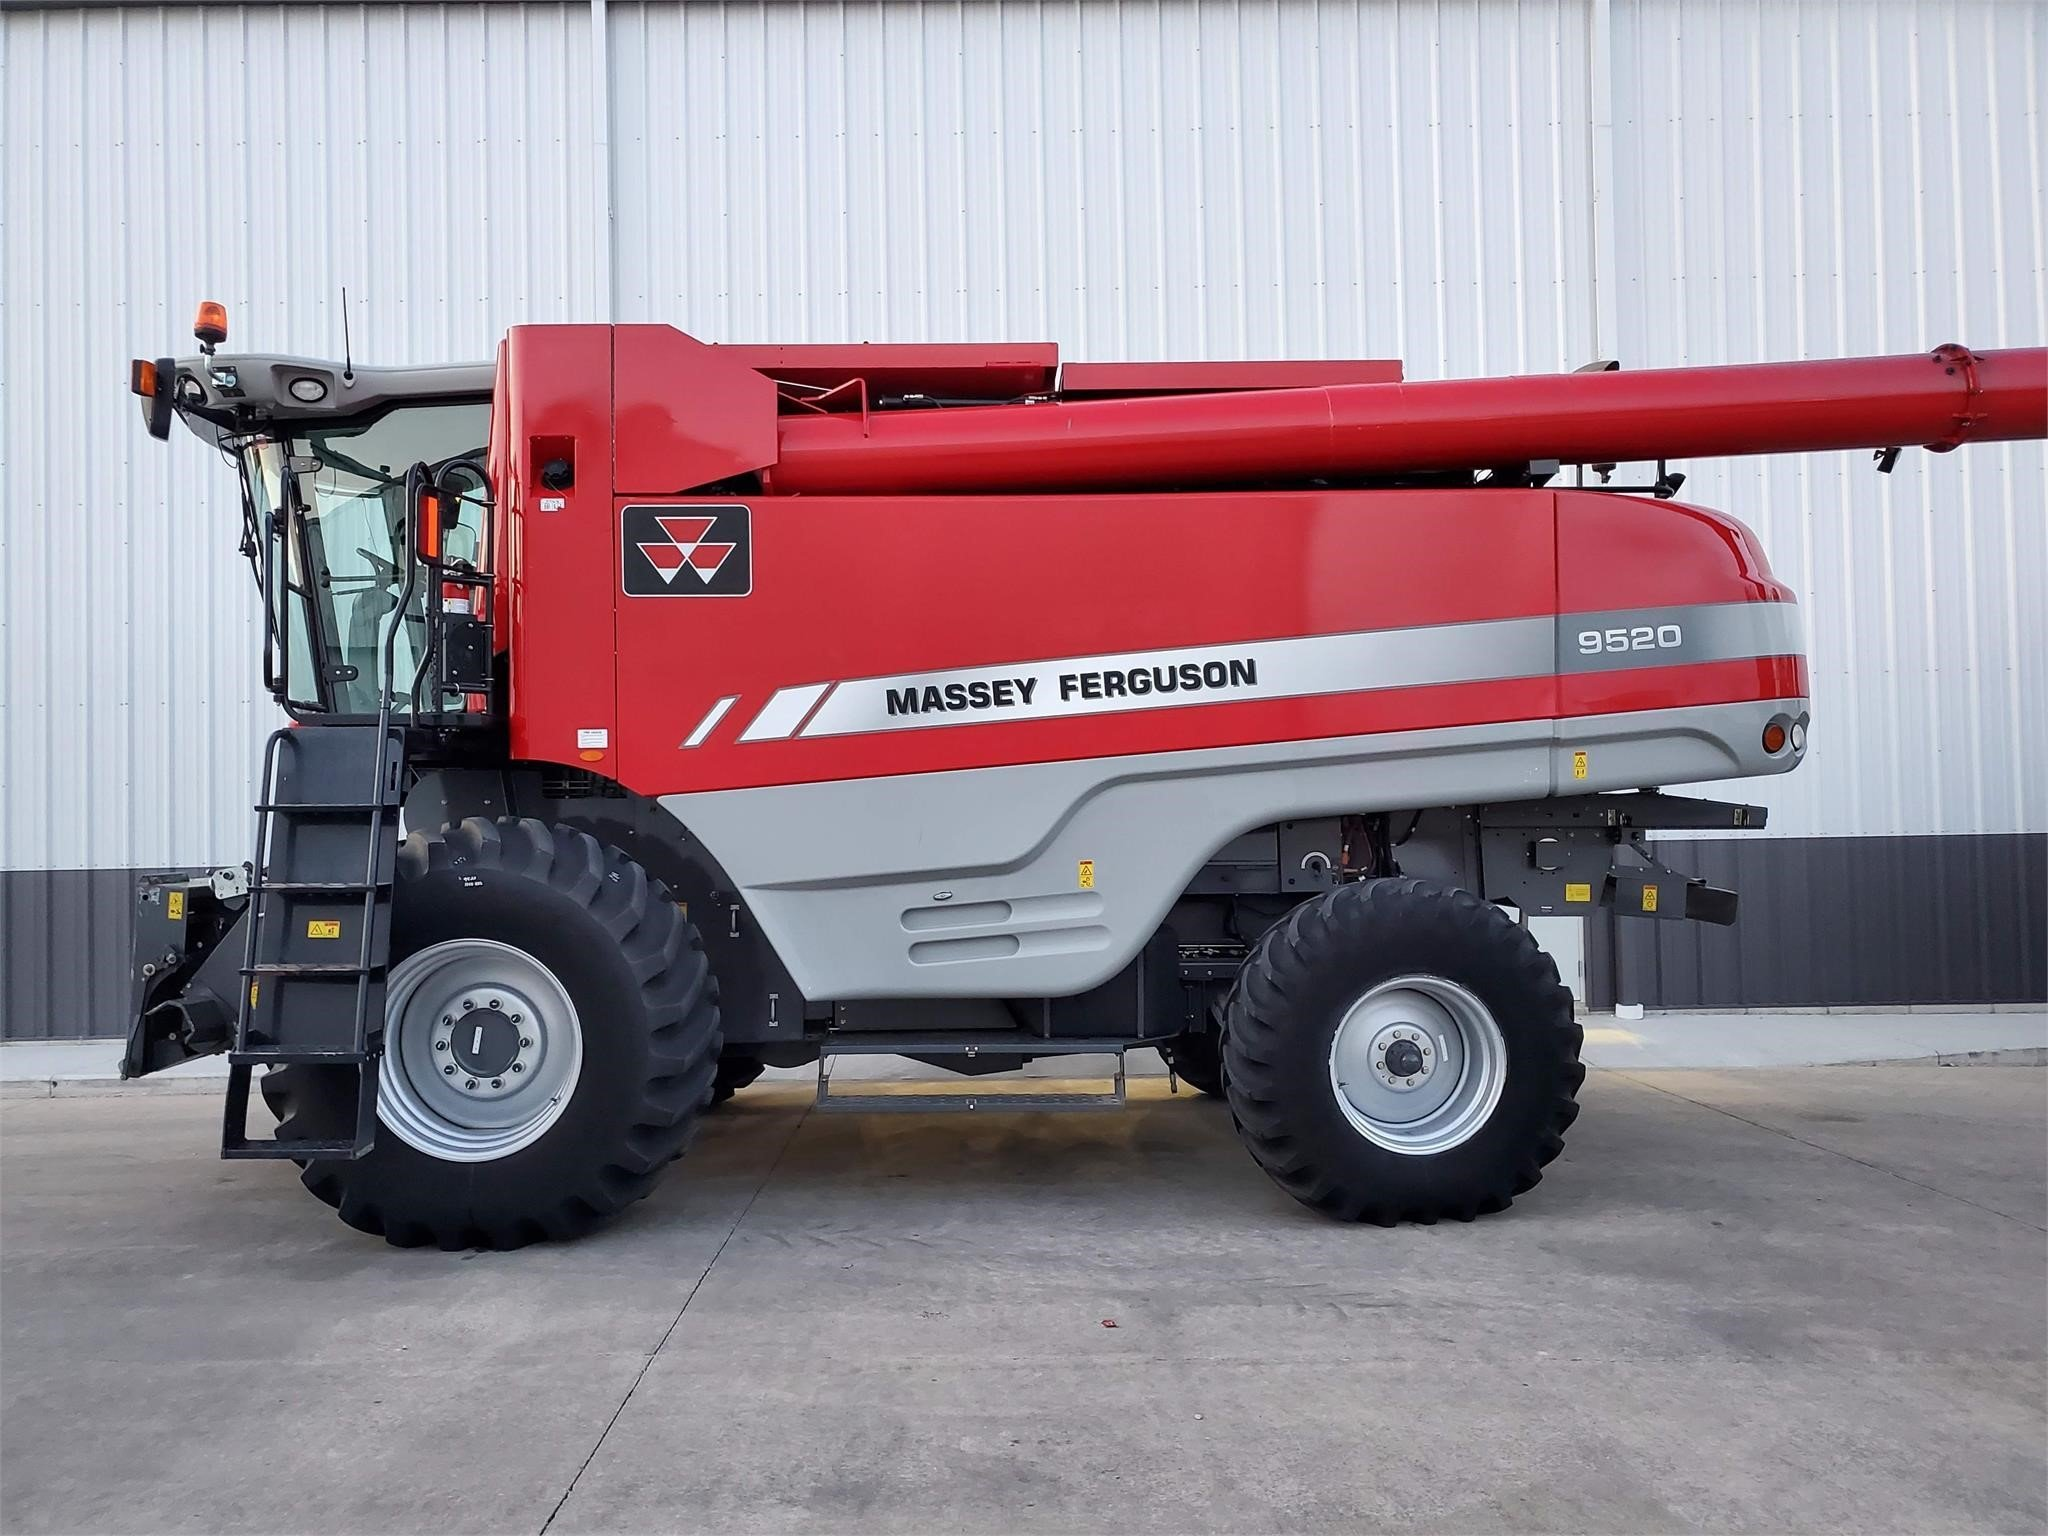 2012 Massey Ferguson 9520 Combine